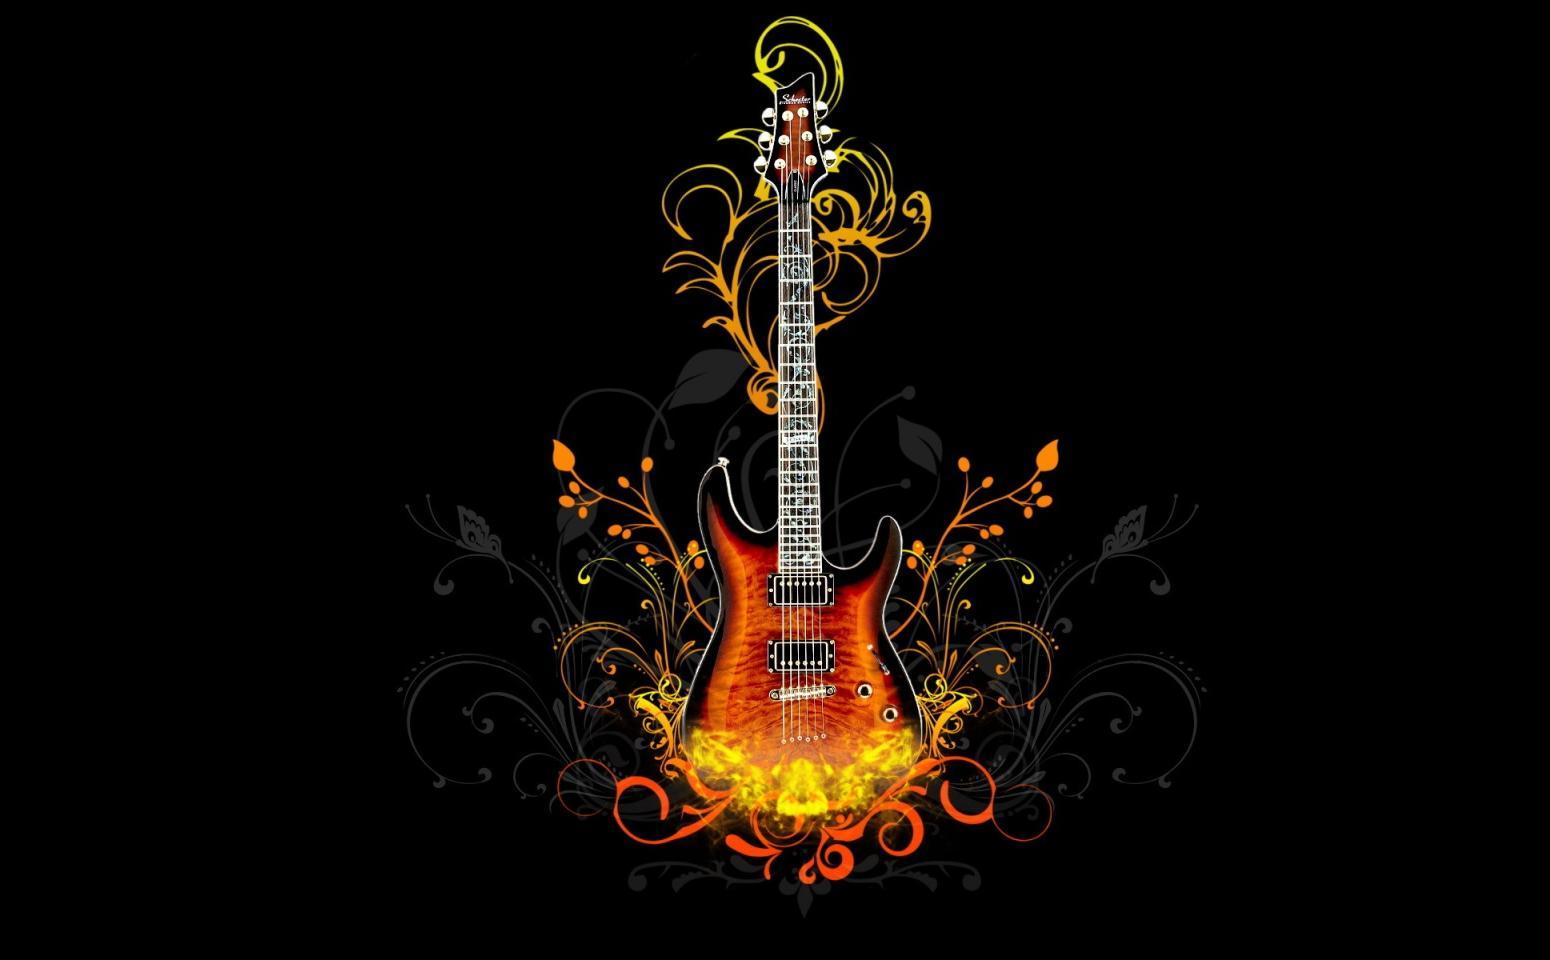 Metal Music Wall